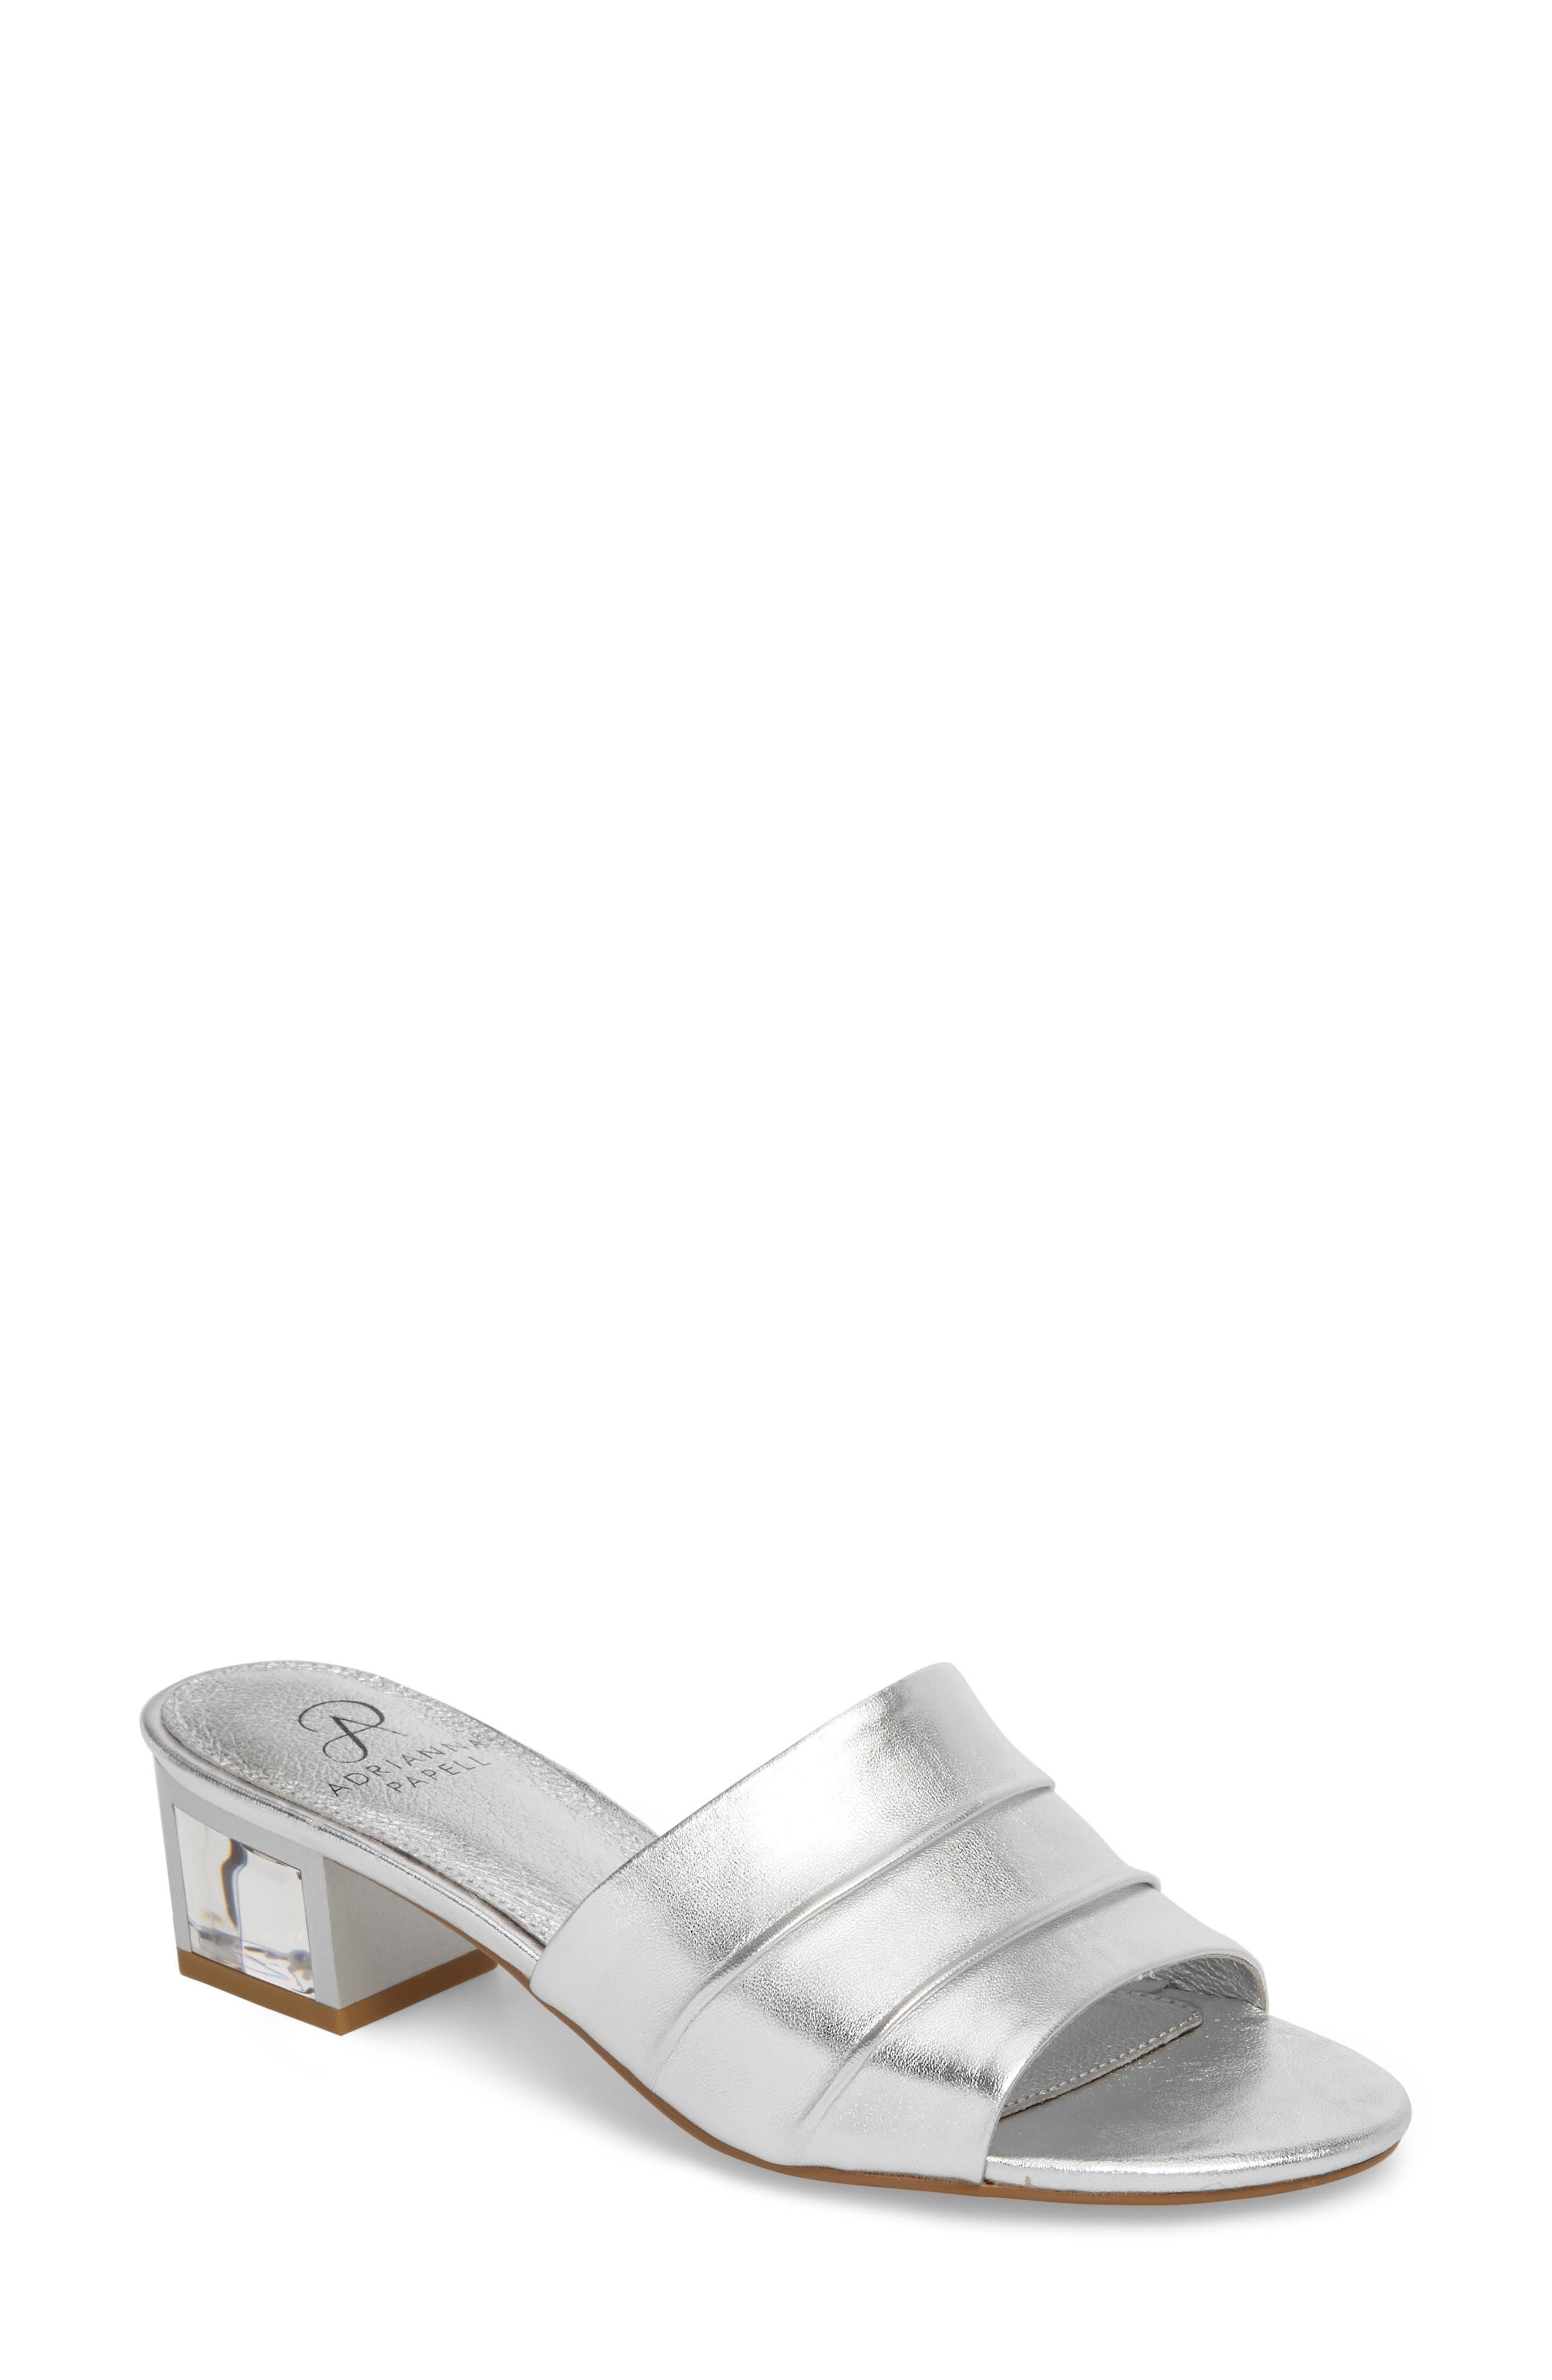 Tiana Block Heel Slide Sandal,                             Main thumbnail 1, color,                             SILVER LEATHER